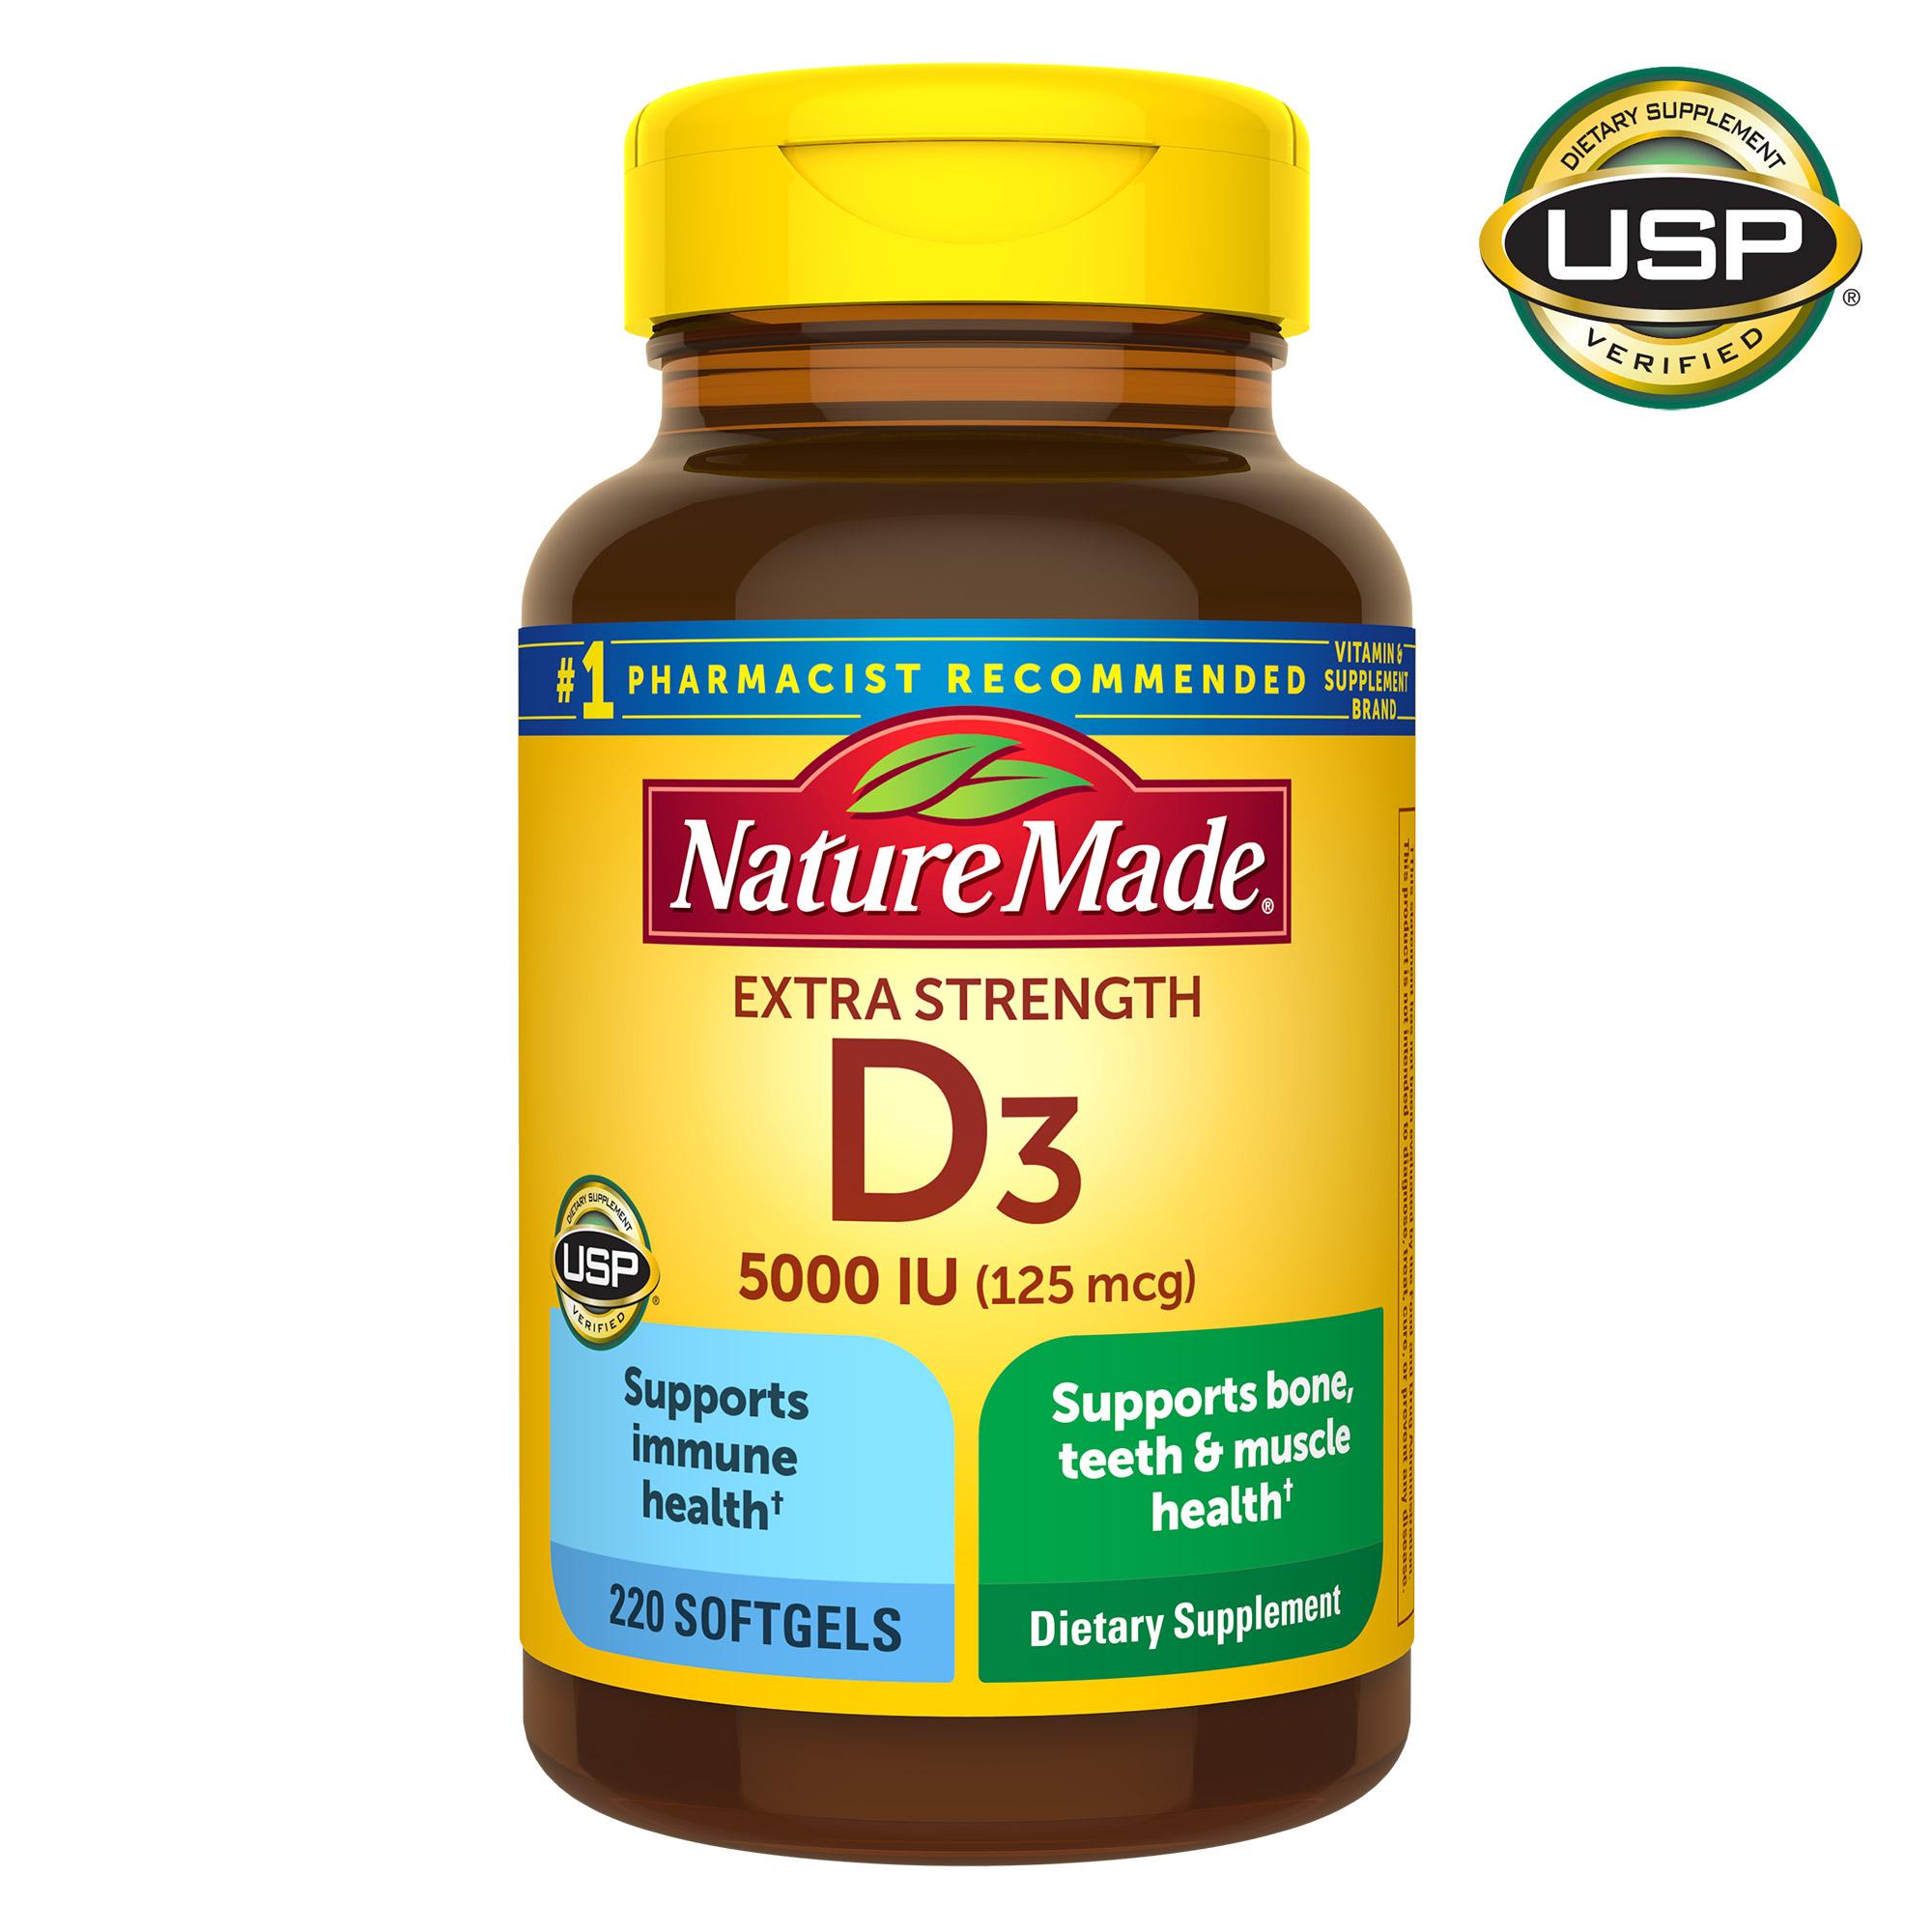 Nature Made 莱萃美强效维生素D3软胶囊,5000 IU(125微克),220粒